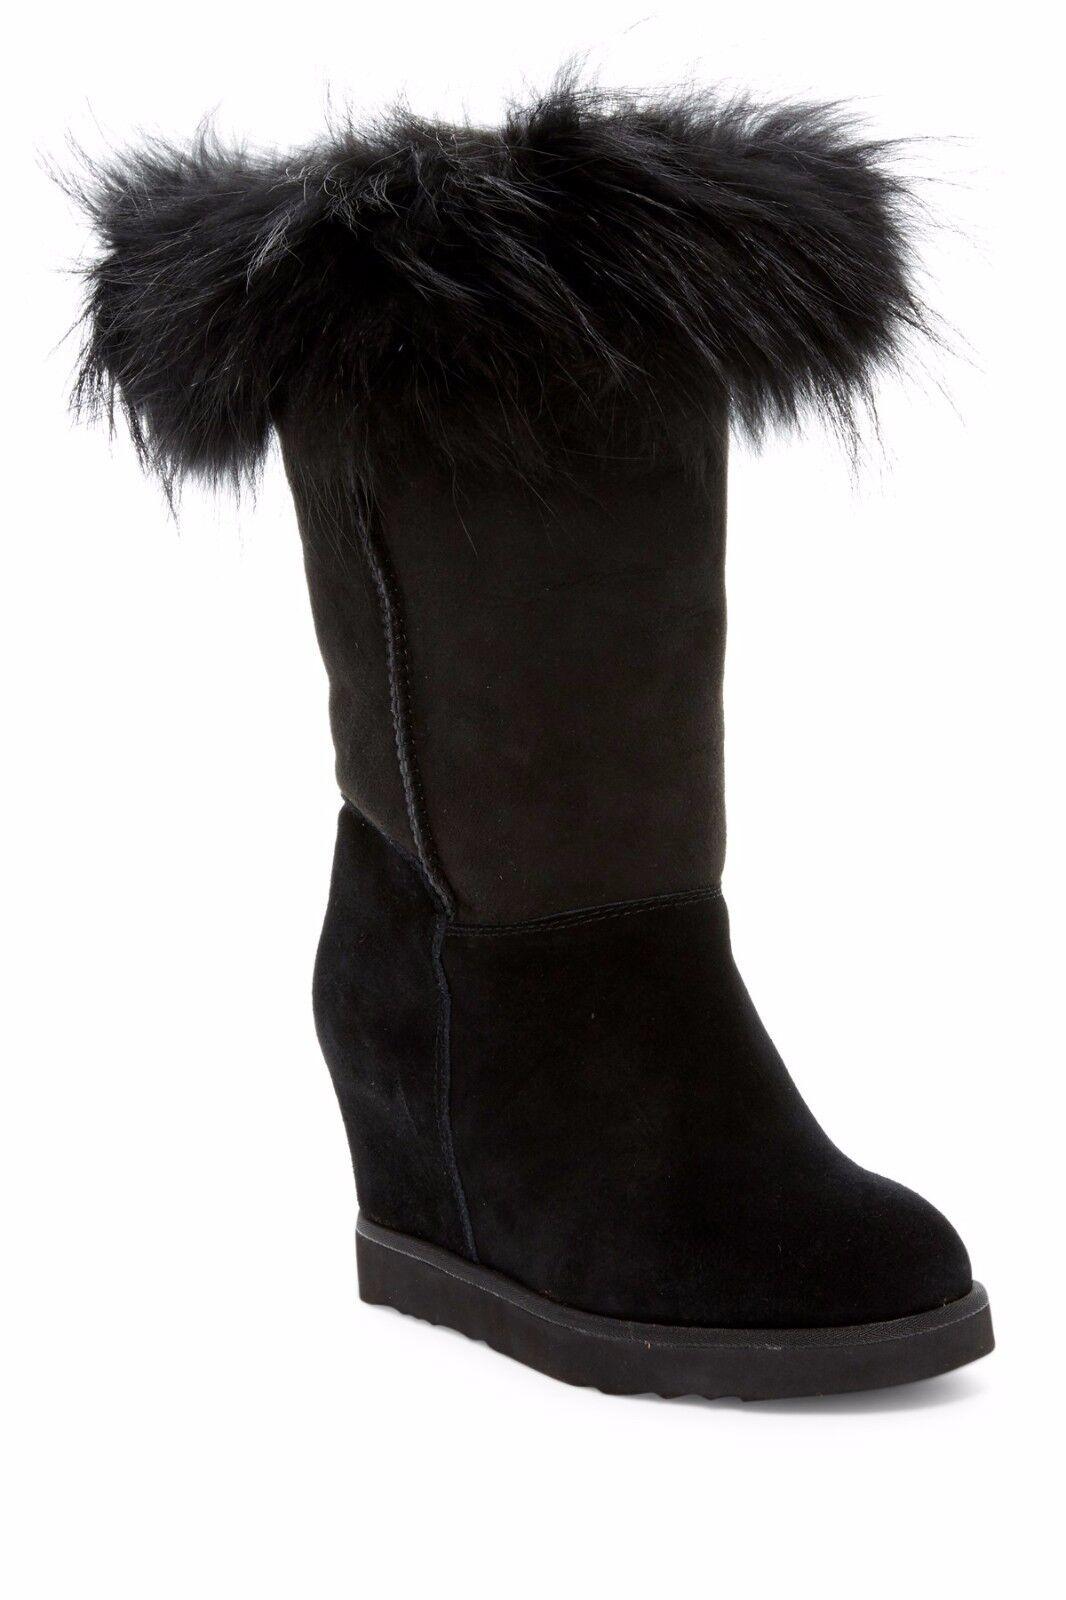 Australia Luxe Collective NIB FOXY Tall Hidden Wedge Fox Fur Boot Black 11 $410